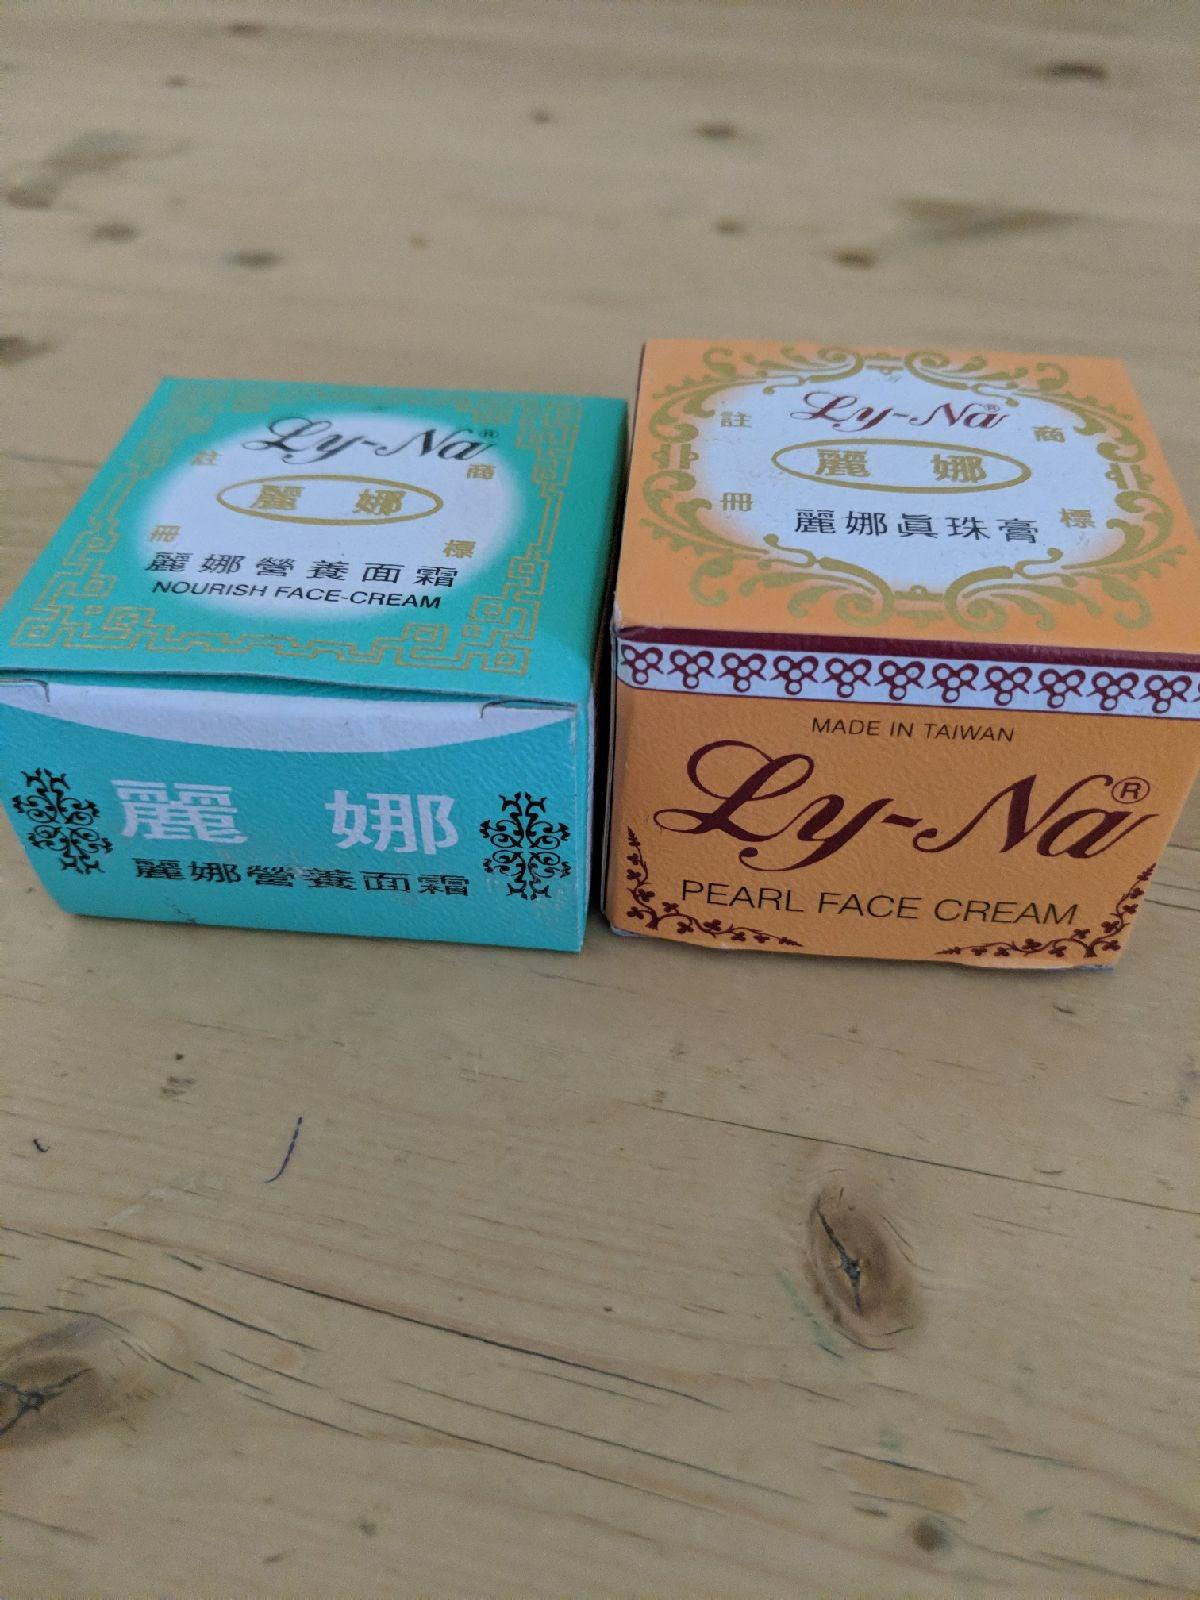 Ly-Na Face Cream bundle